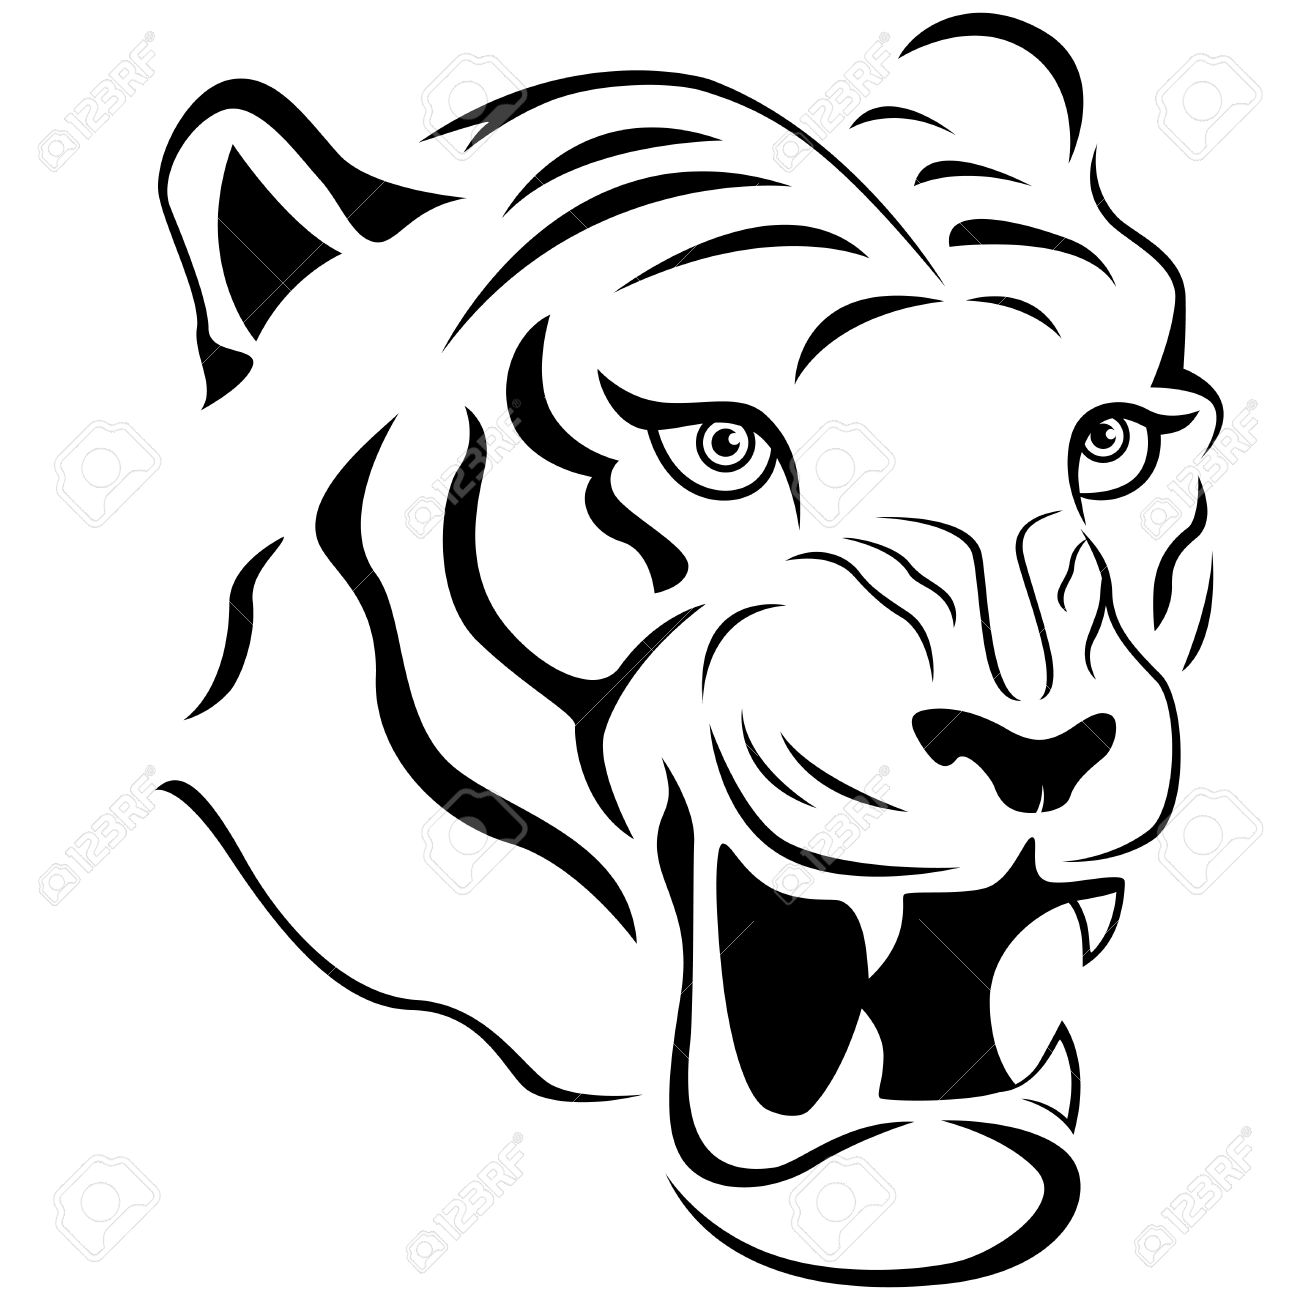 Dessin De Tête De Tigre